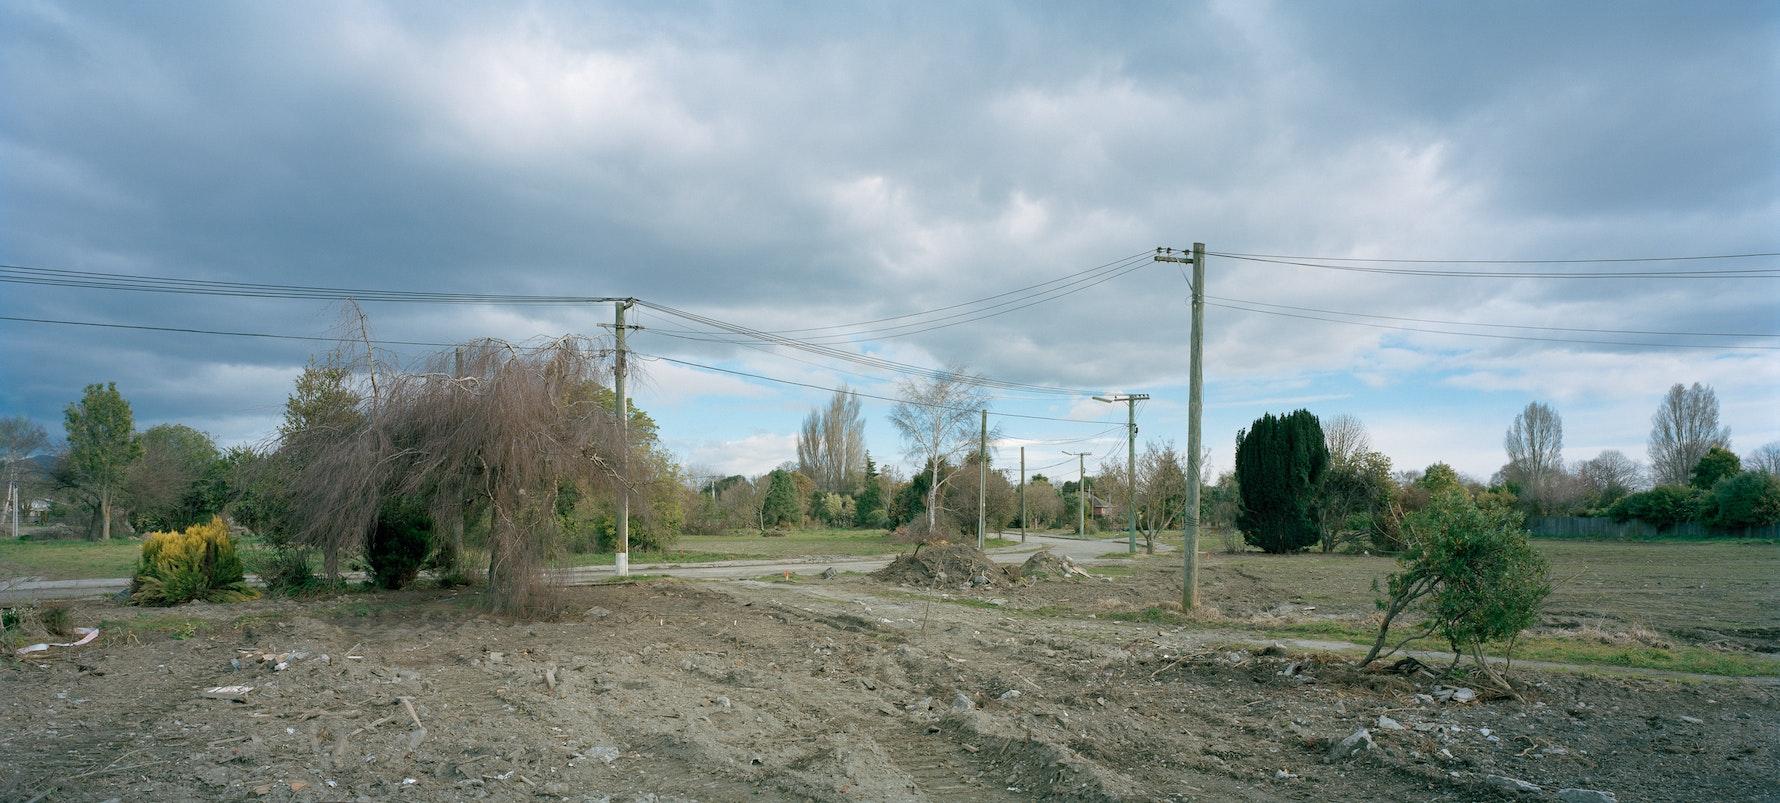 Maling Street, 2014. Demolished social housing area. Facing south.